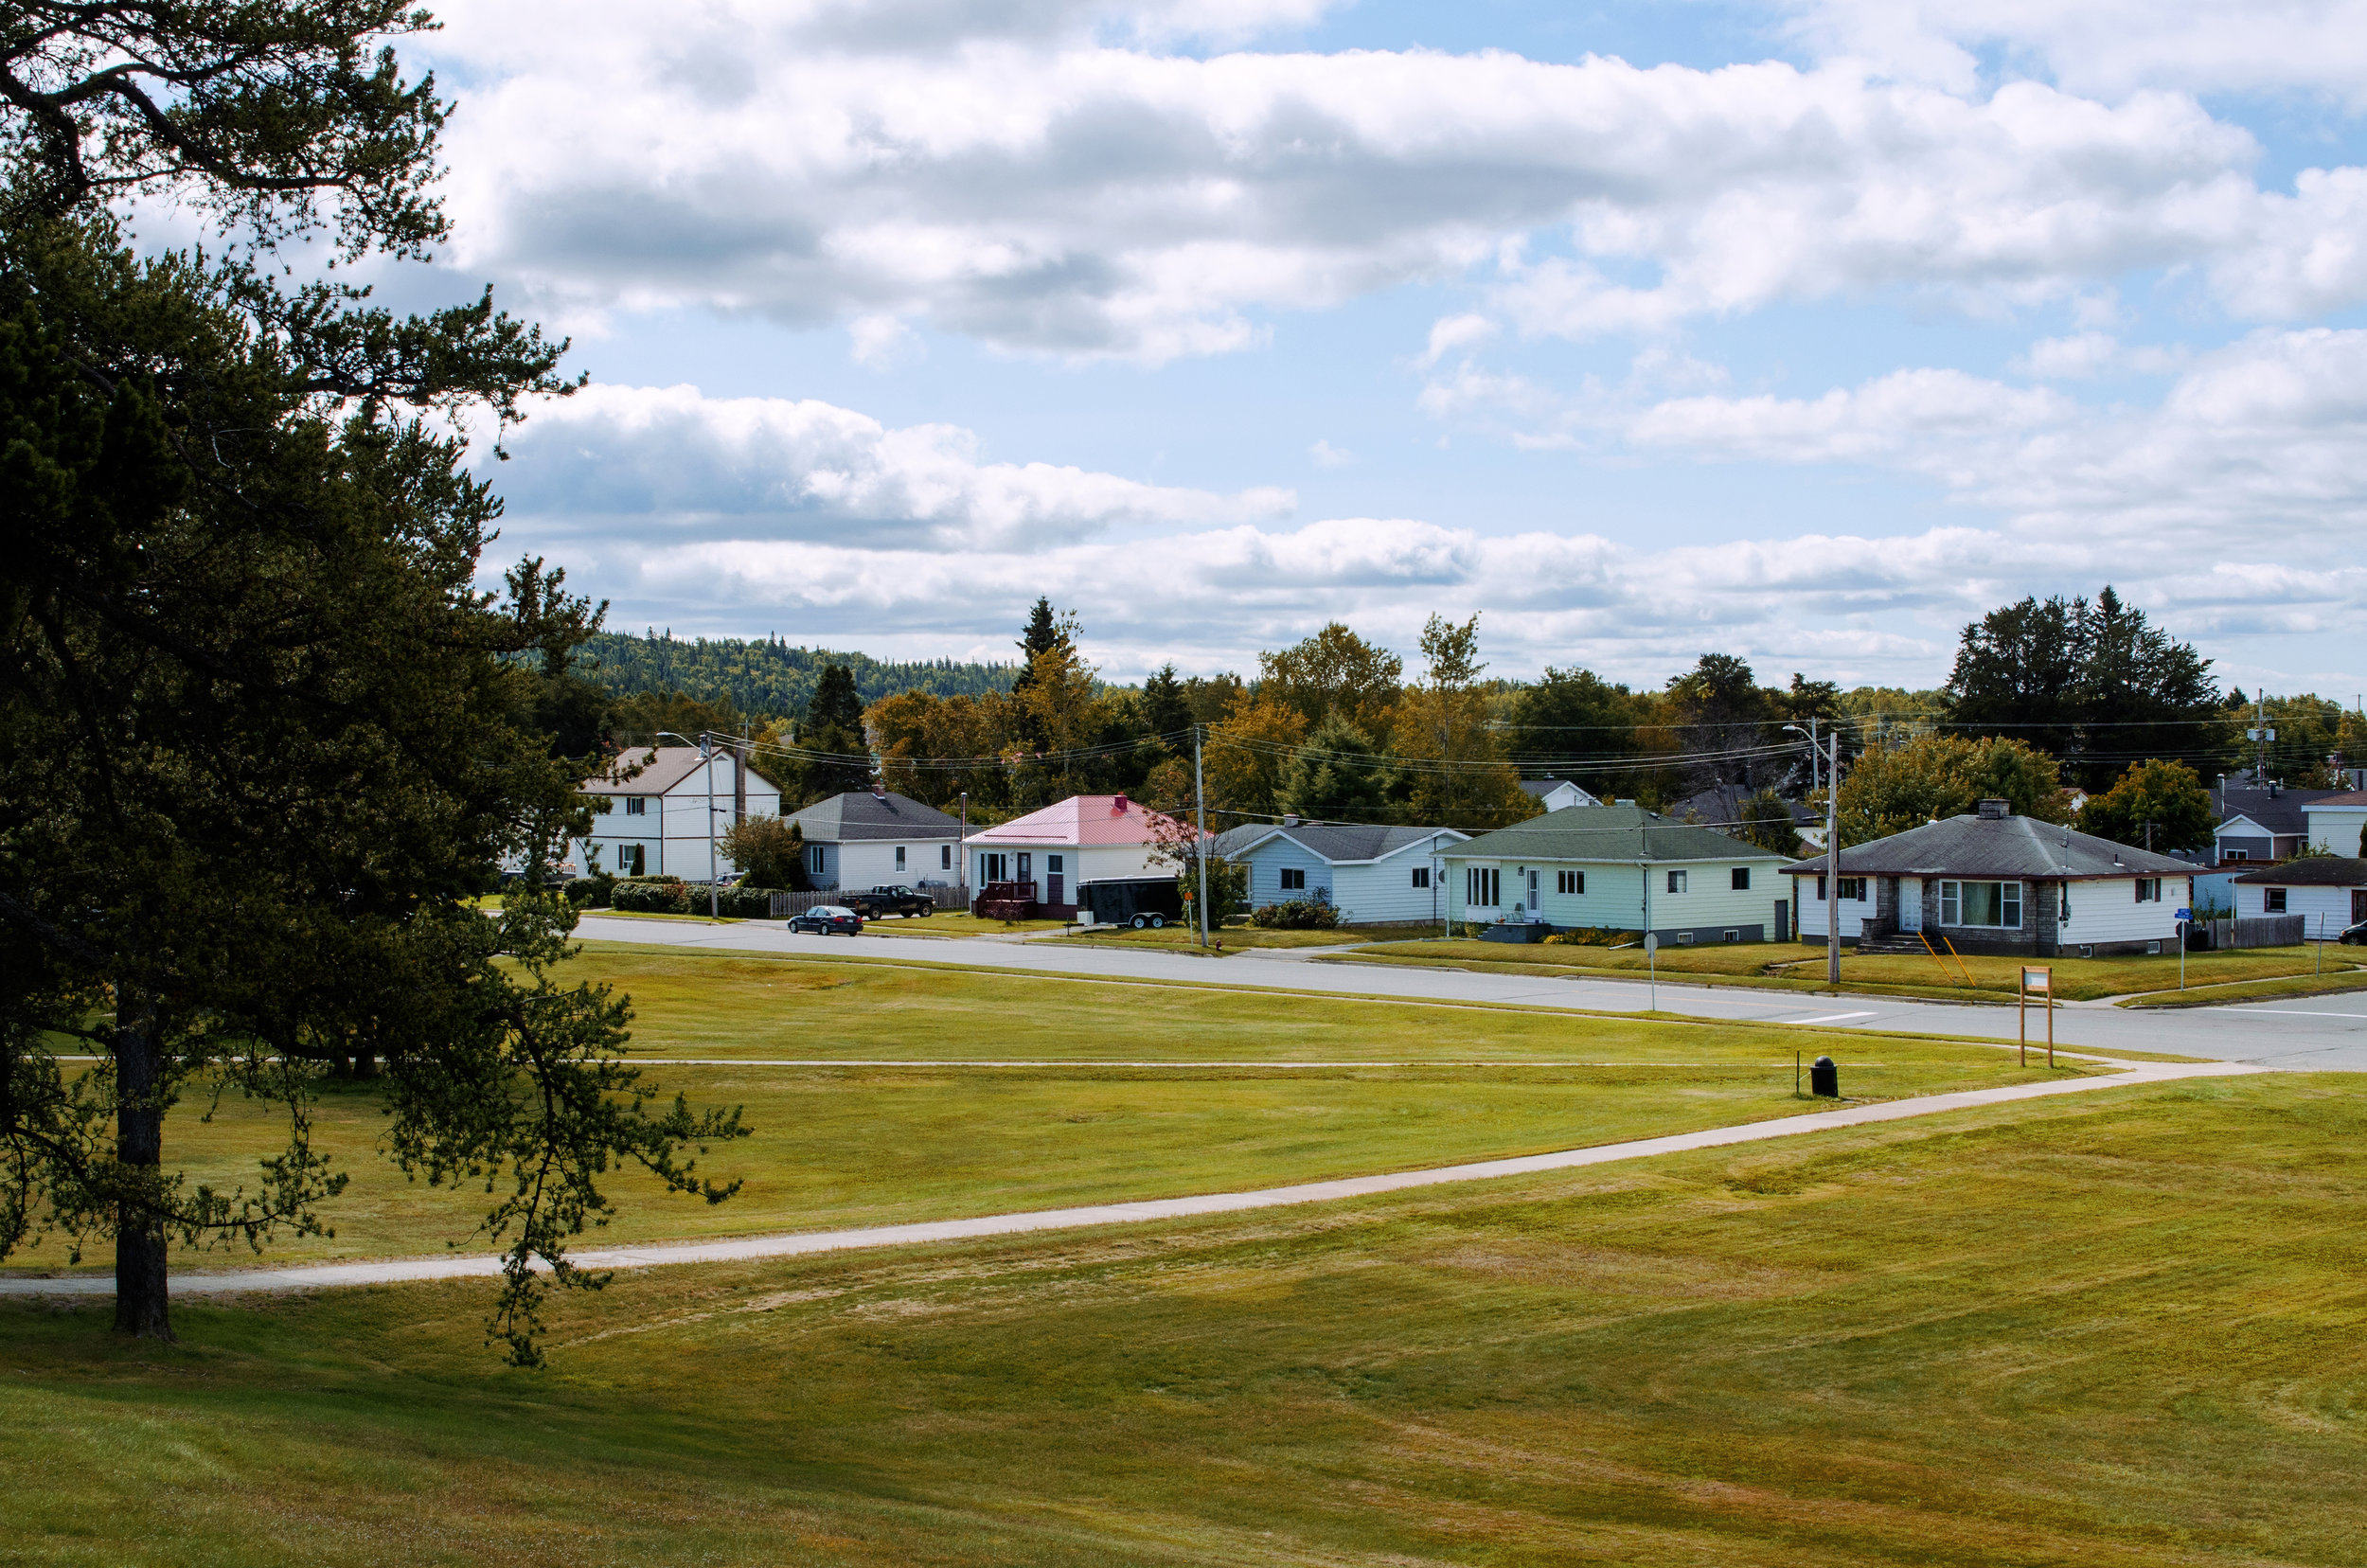 Jenkins, Cheyenne. Houses. 2017. Digital Photography. Wawa, Ontario